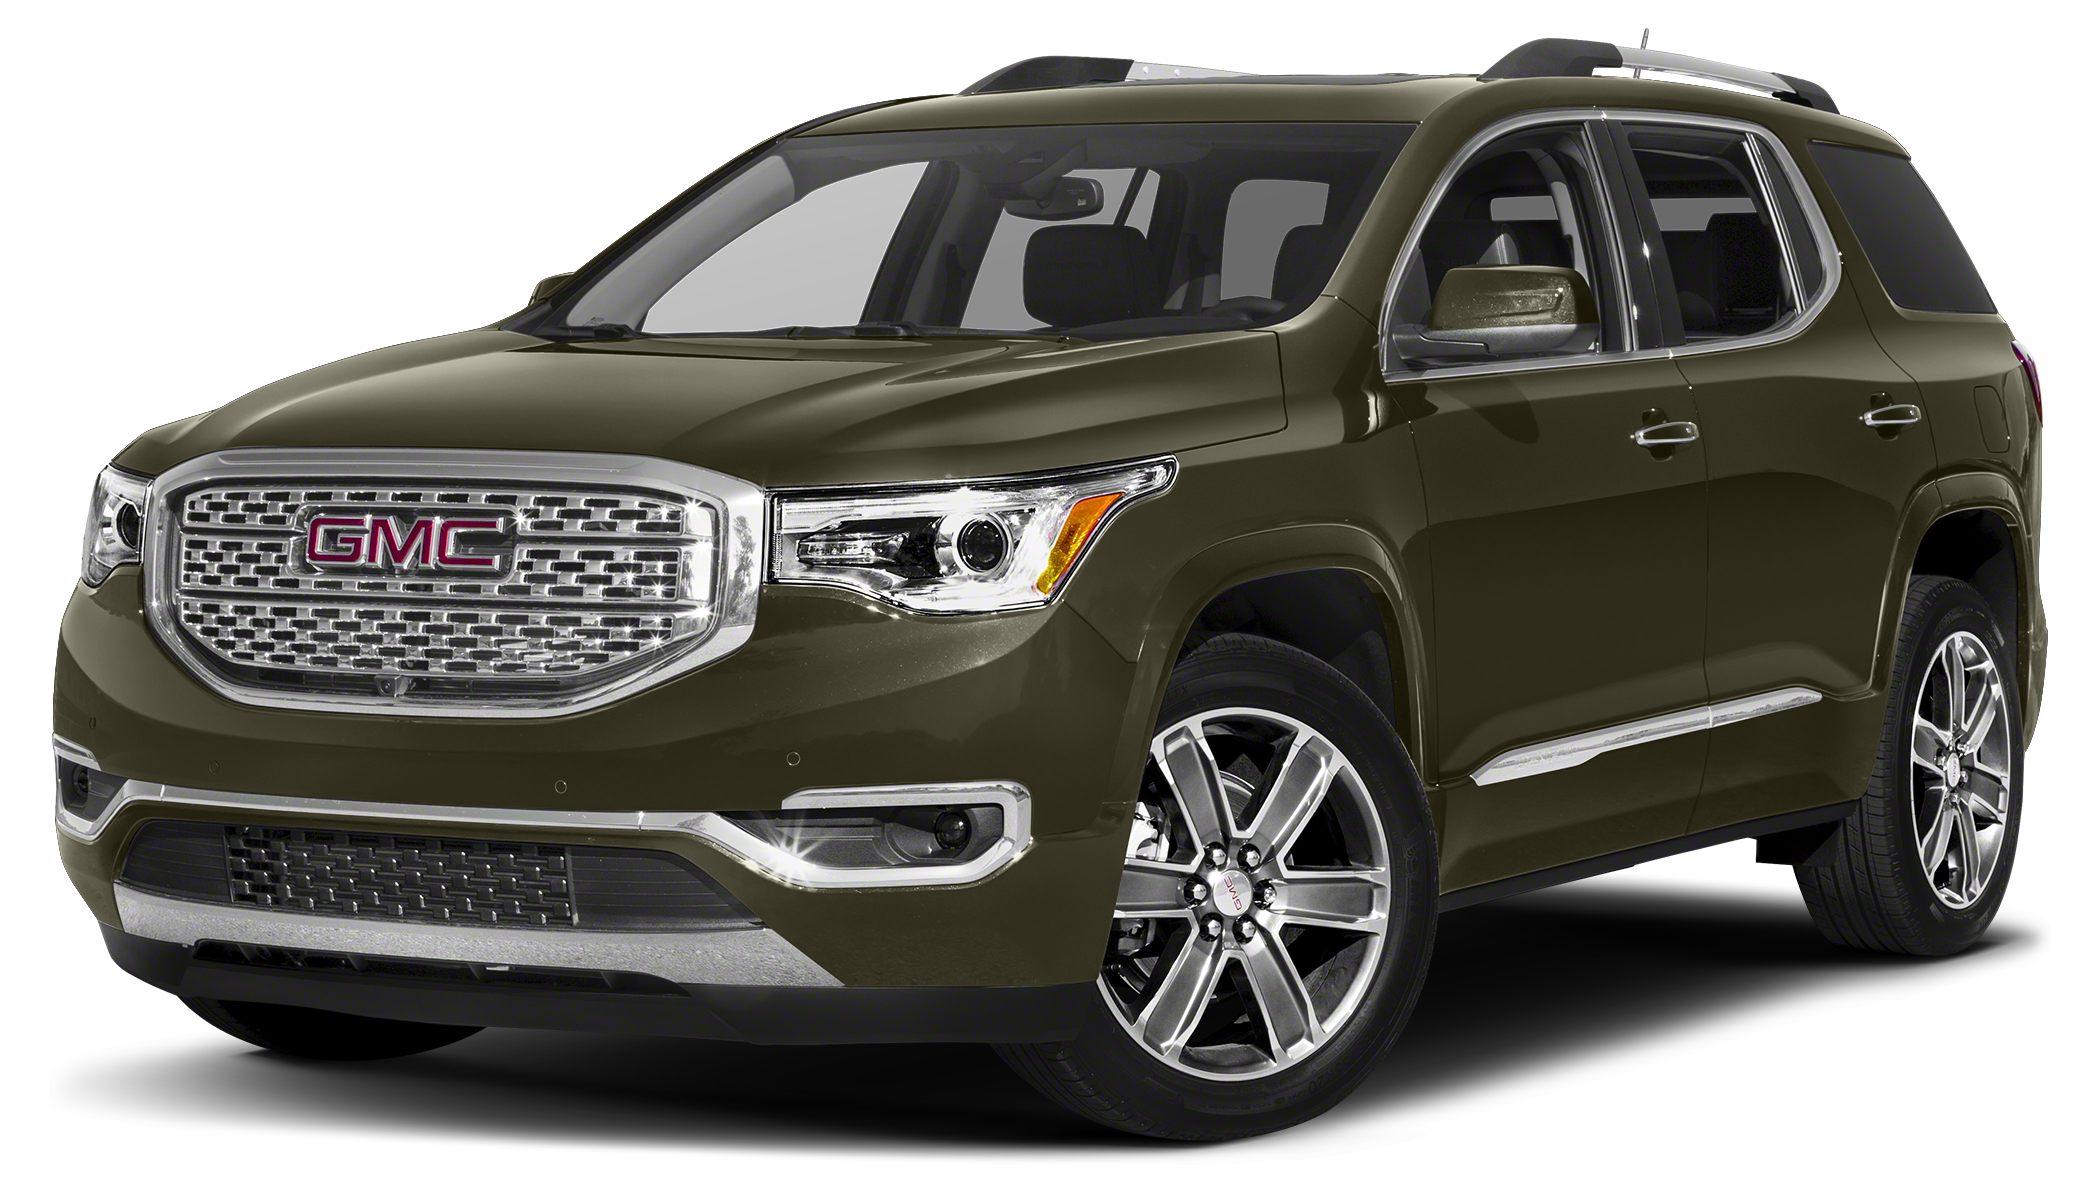 jeep grand cherokee summit  acura mdx elite package  bmw  xdrivei  mercedes benz gle